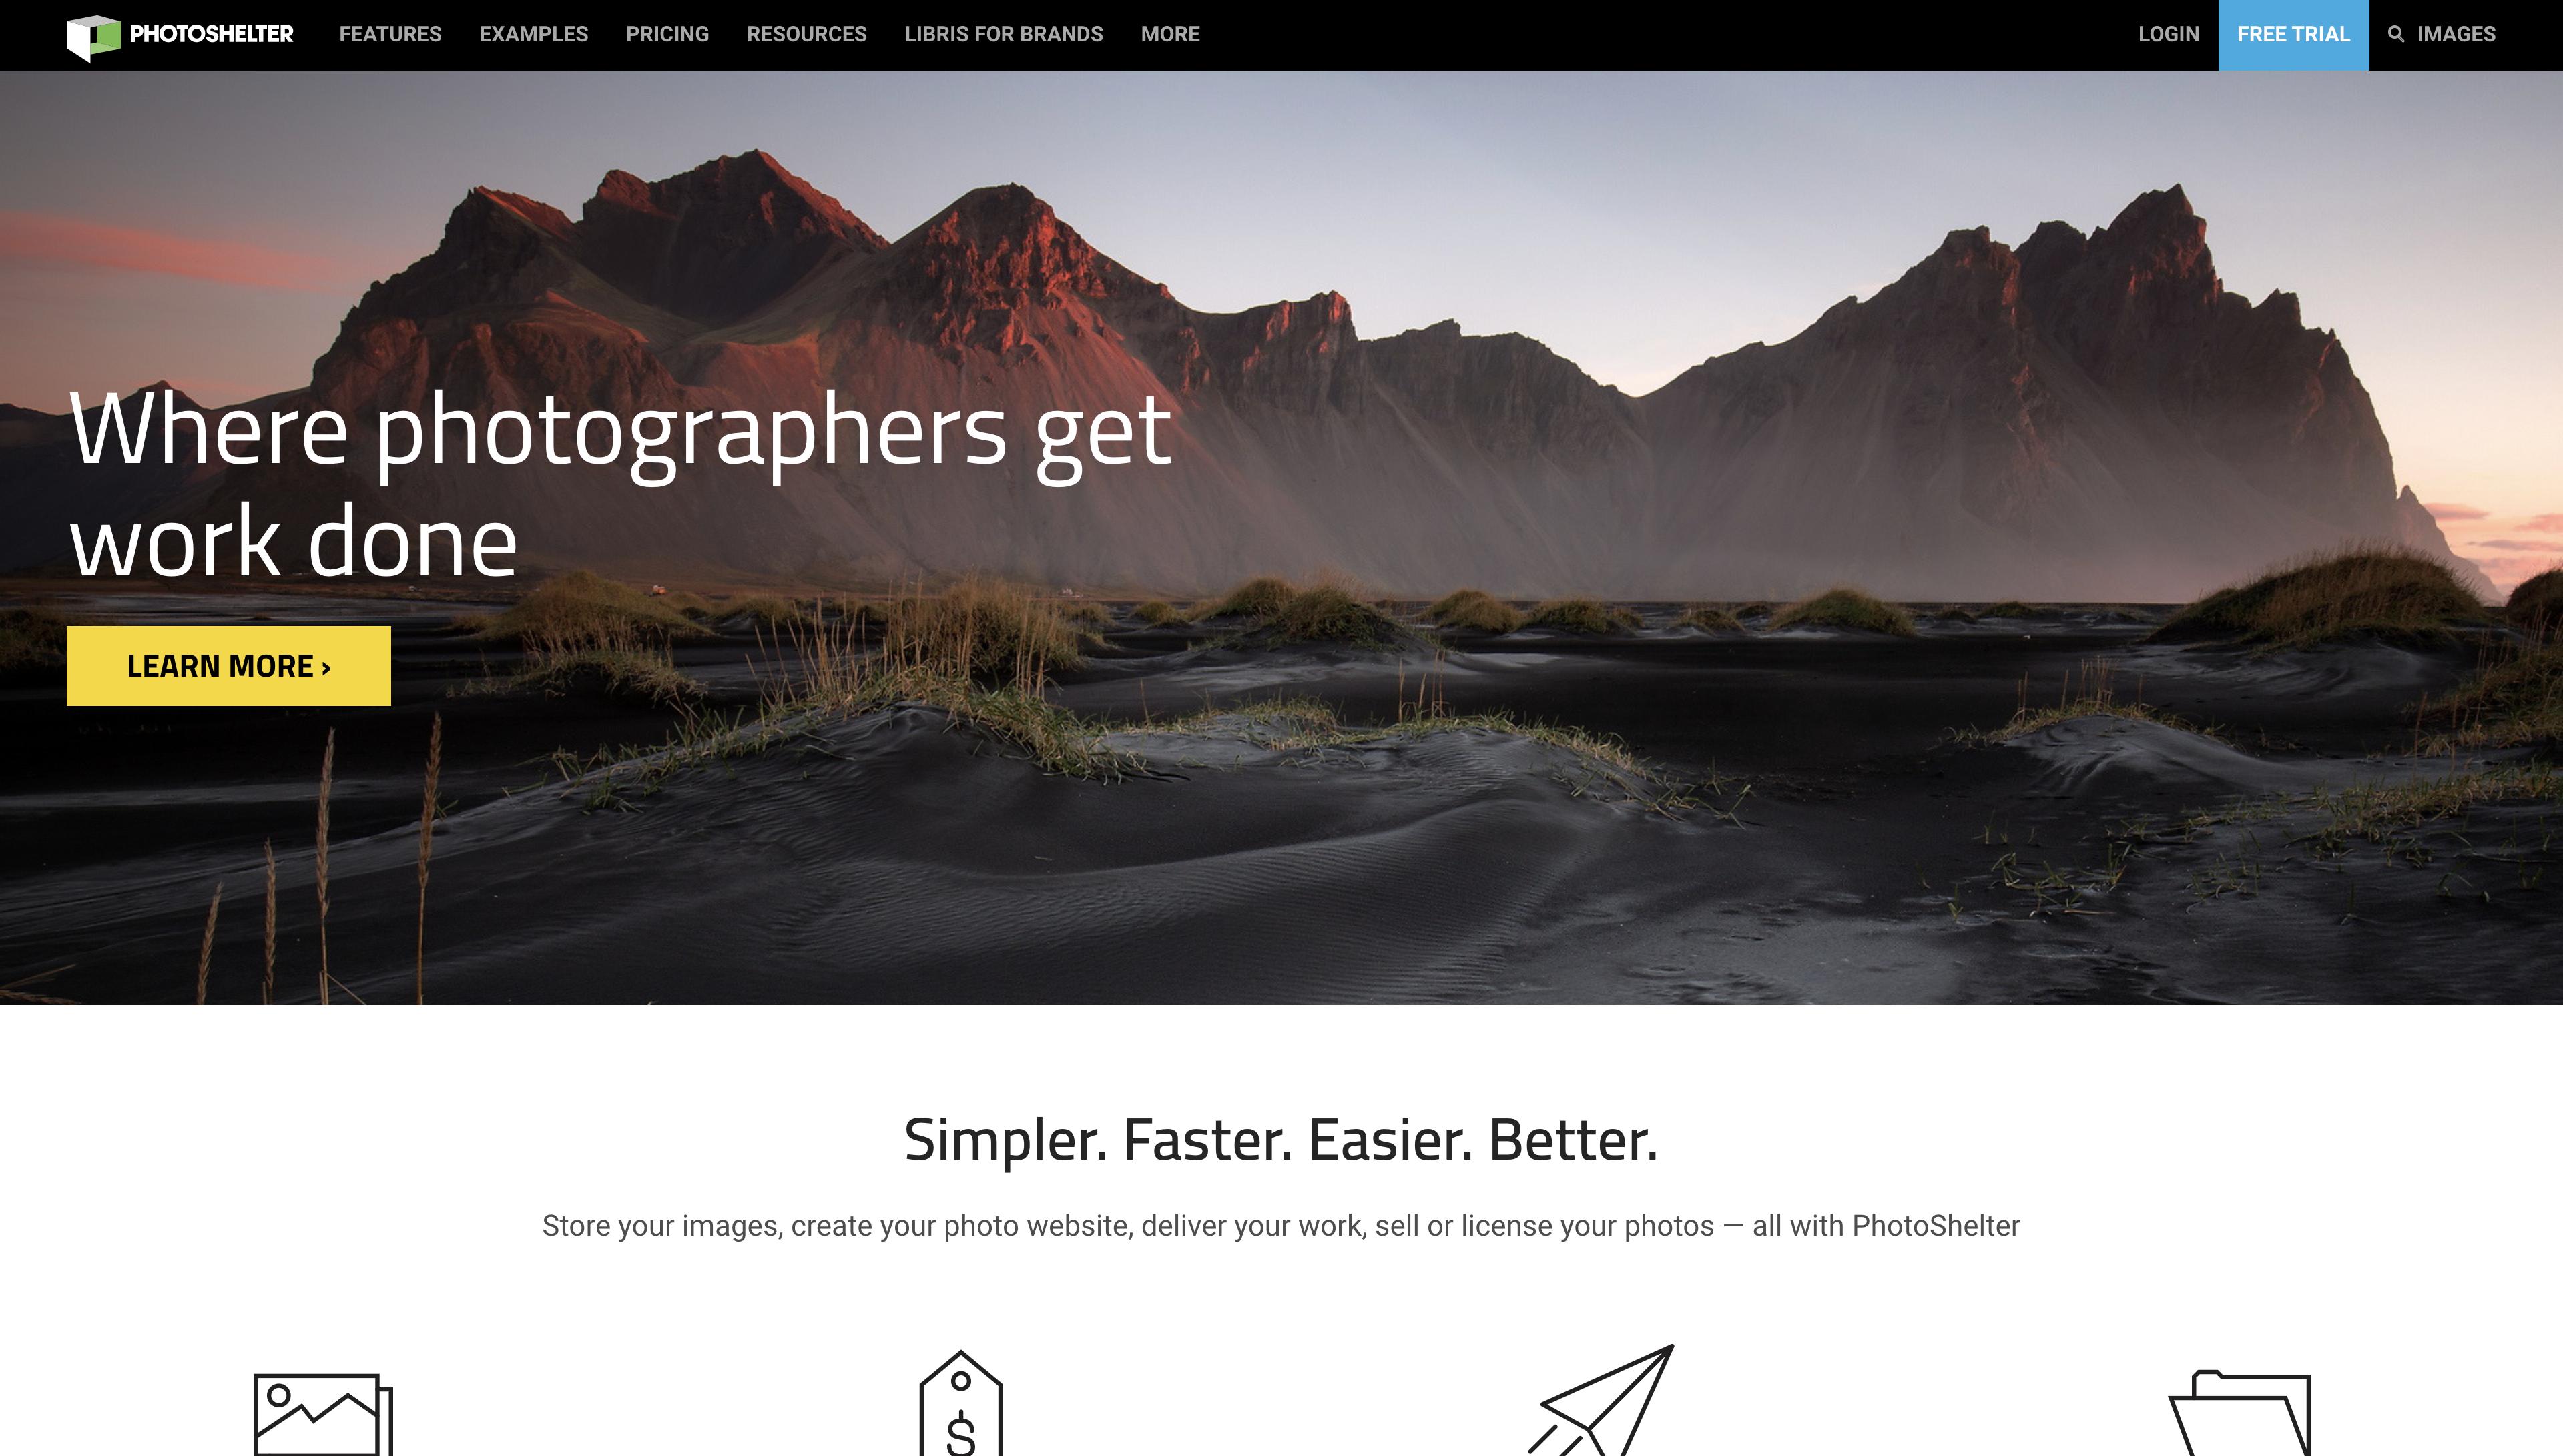 PhotoShelter Website Builder